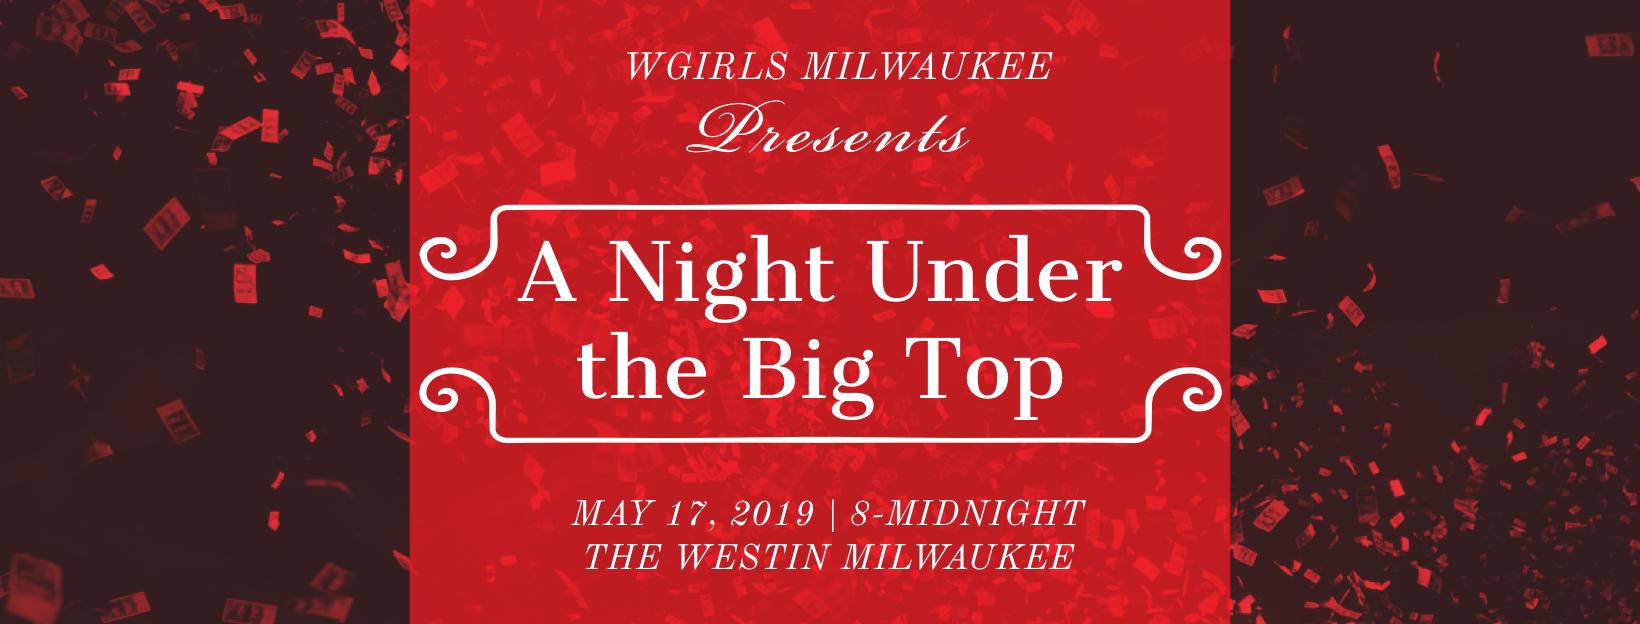 WGIRLS Milwaukee Presents: A Night Under the Big Top